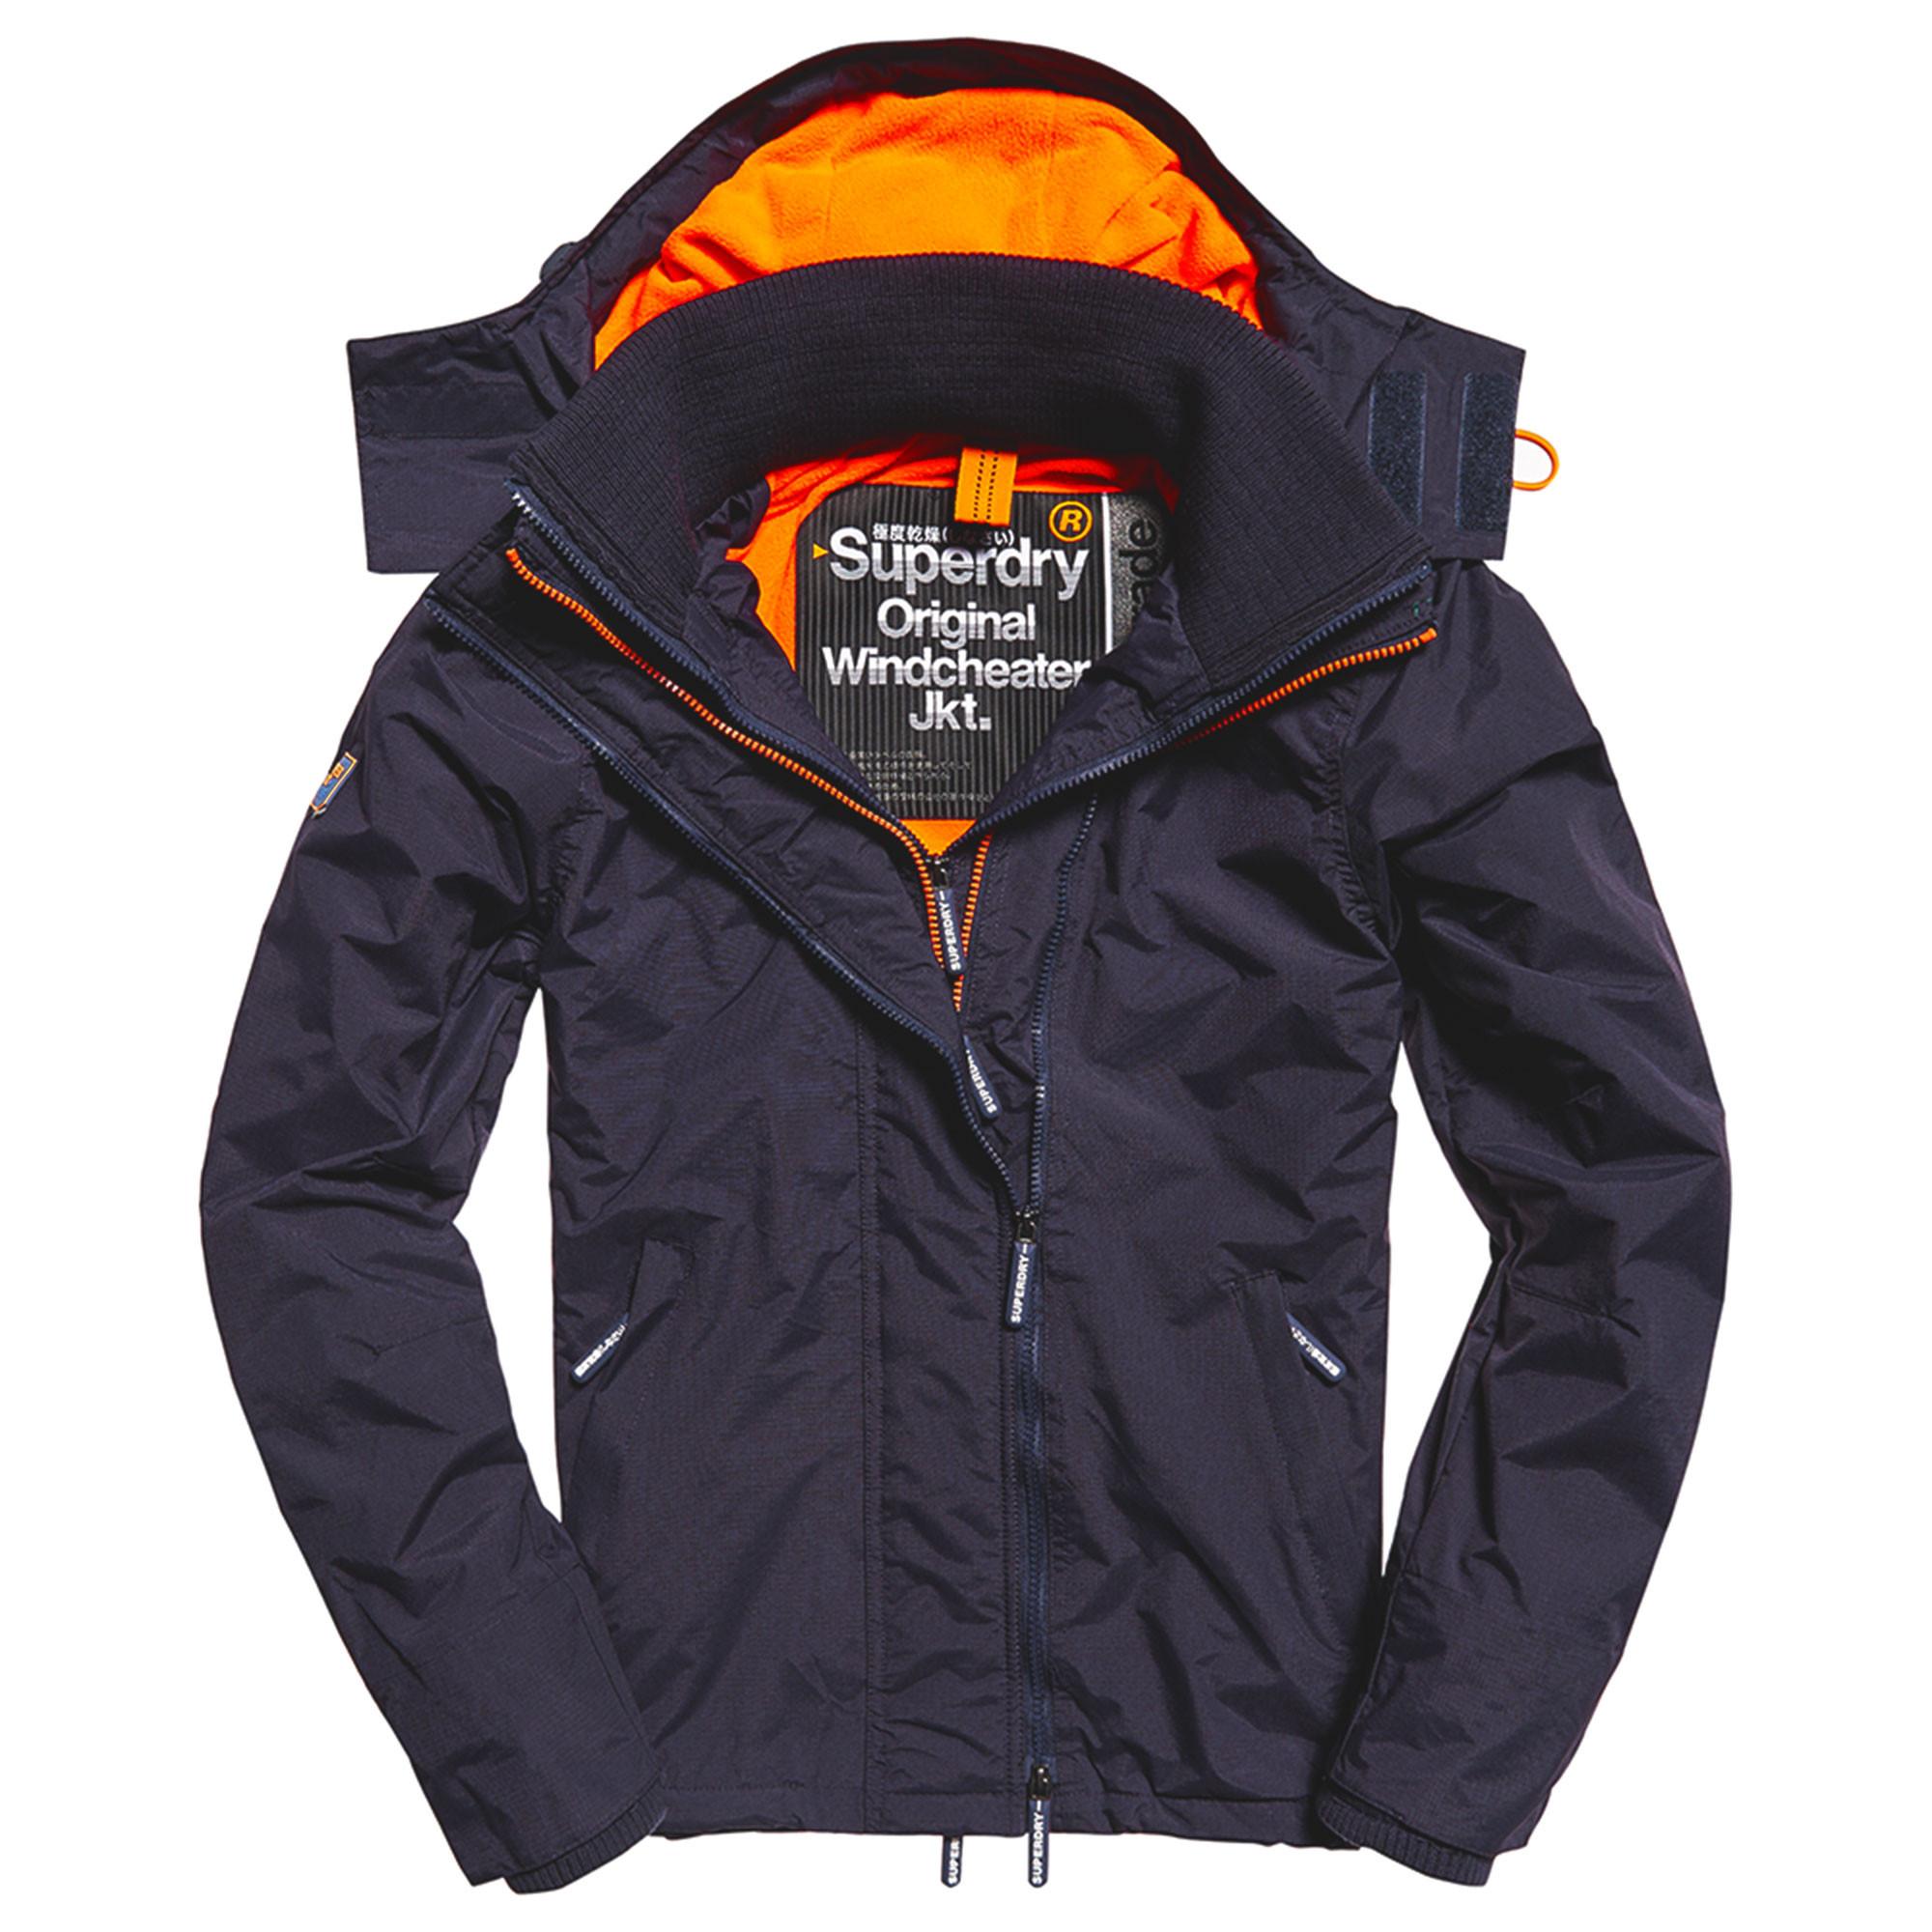 67a4eff4bdecfd Pop Zip Hood Arctic Windcheter Blouson Homme SUPERDRY BLEU pas cher -  Blousons homme SUPERDRY discount